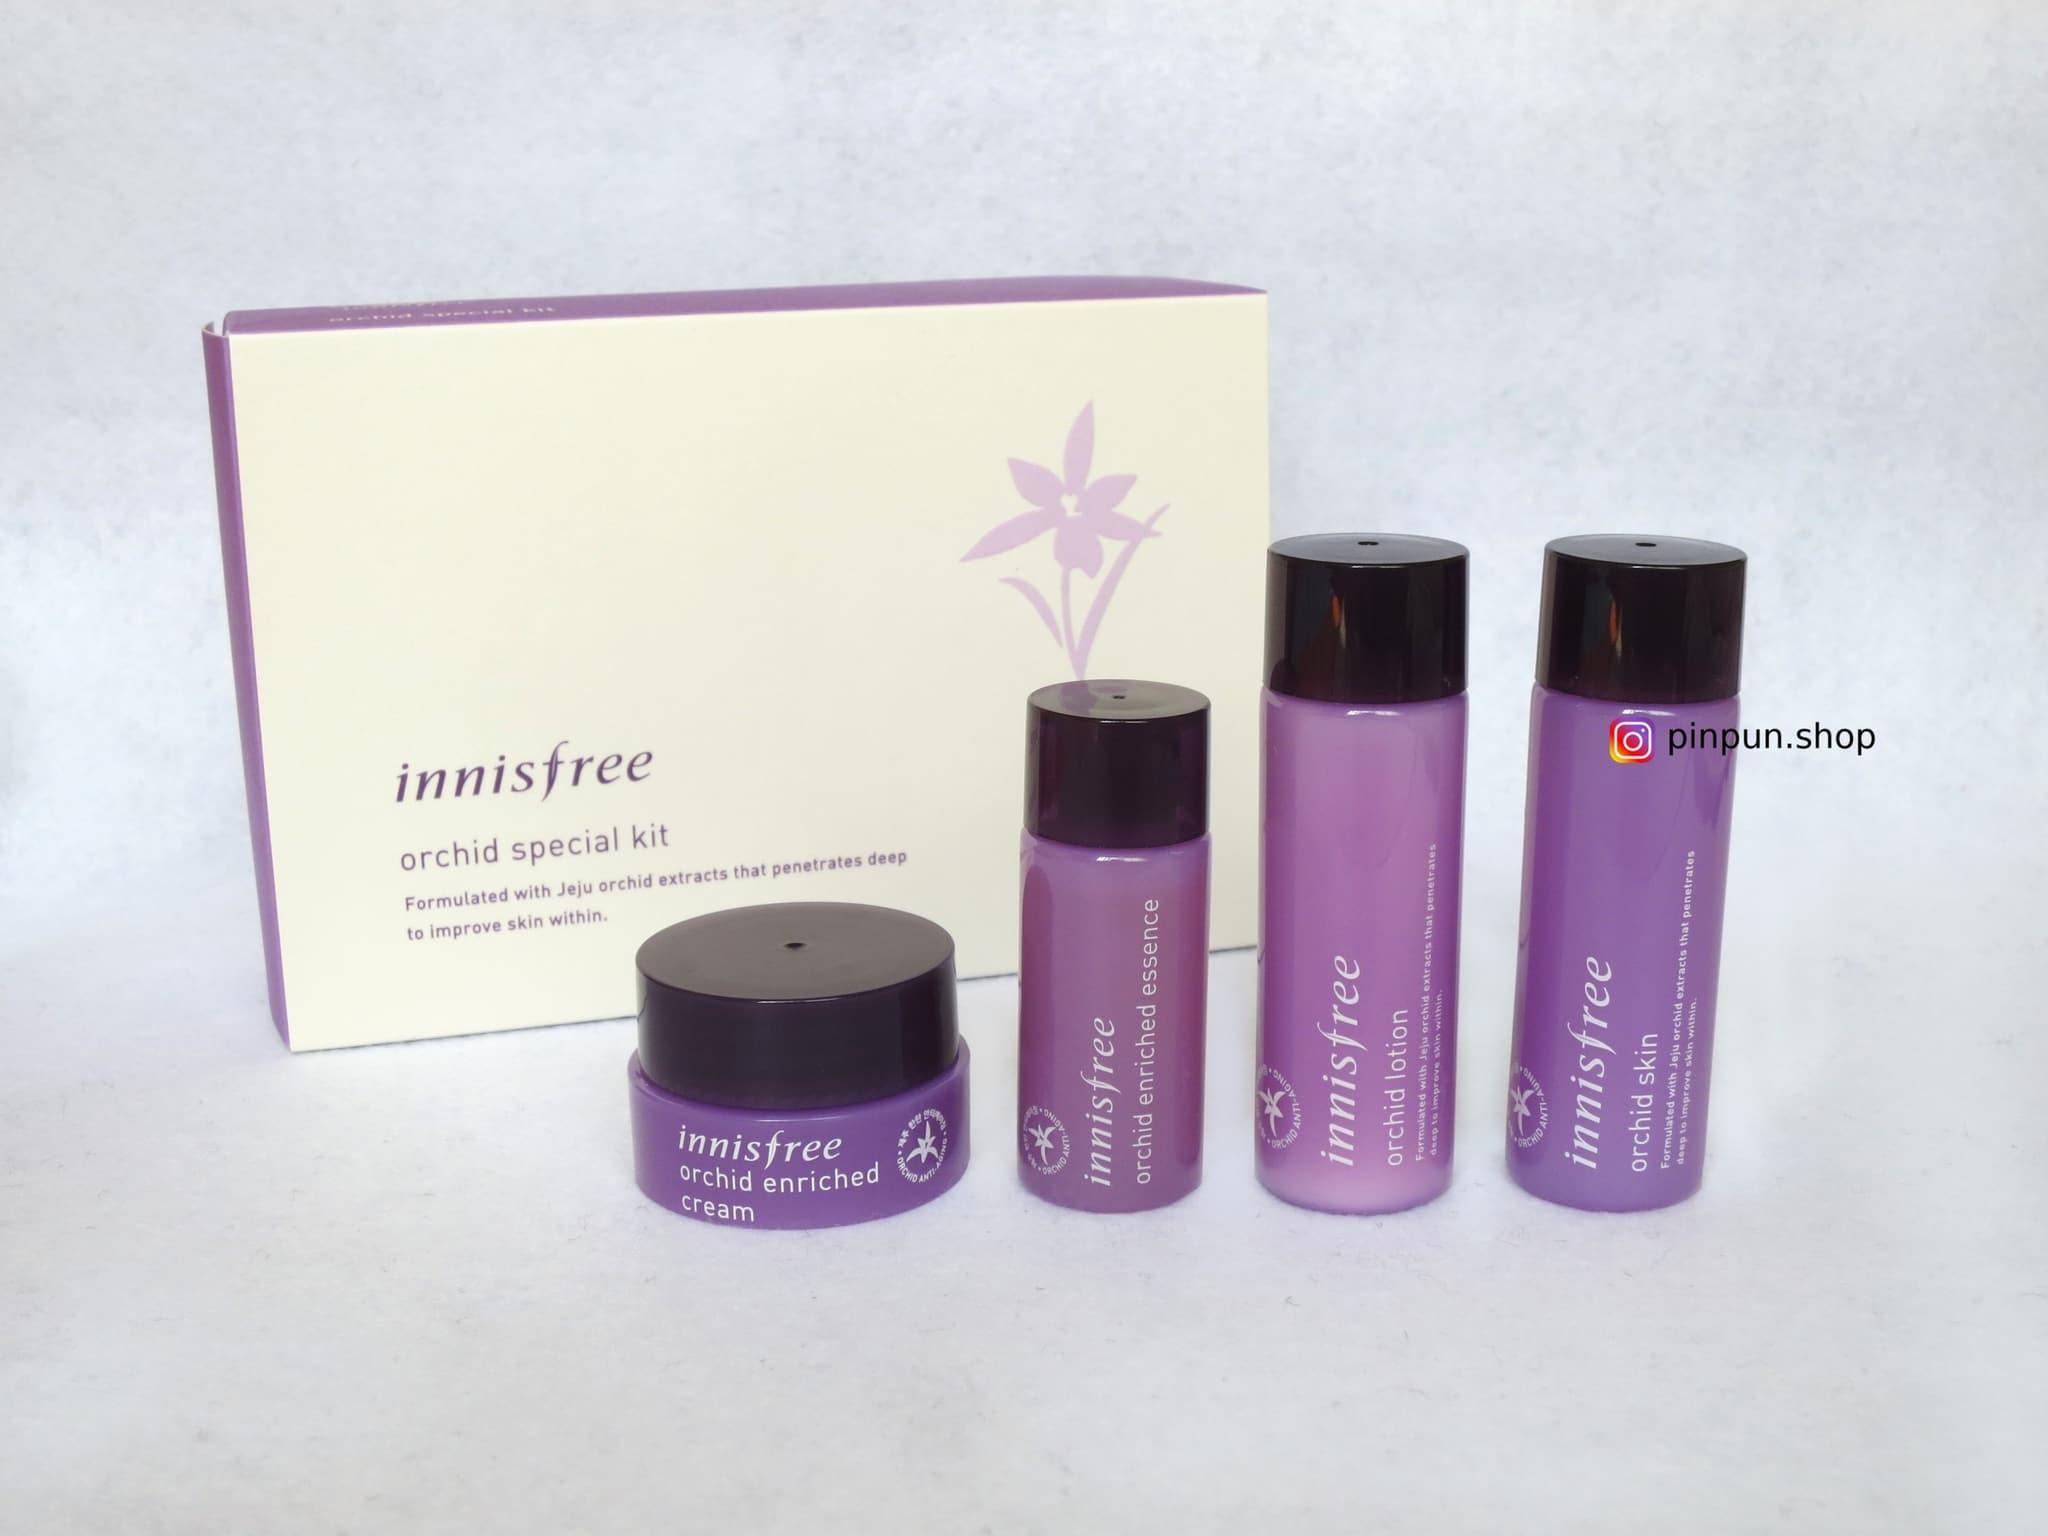 Jual Innisfree Orchid Special Kit 4 Items Pinpunshop Tokopedia Skin